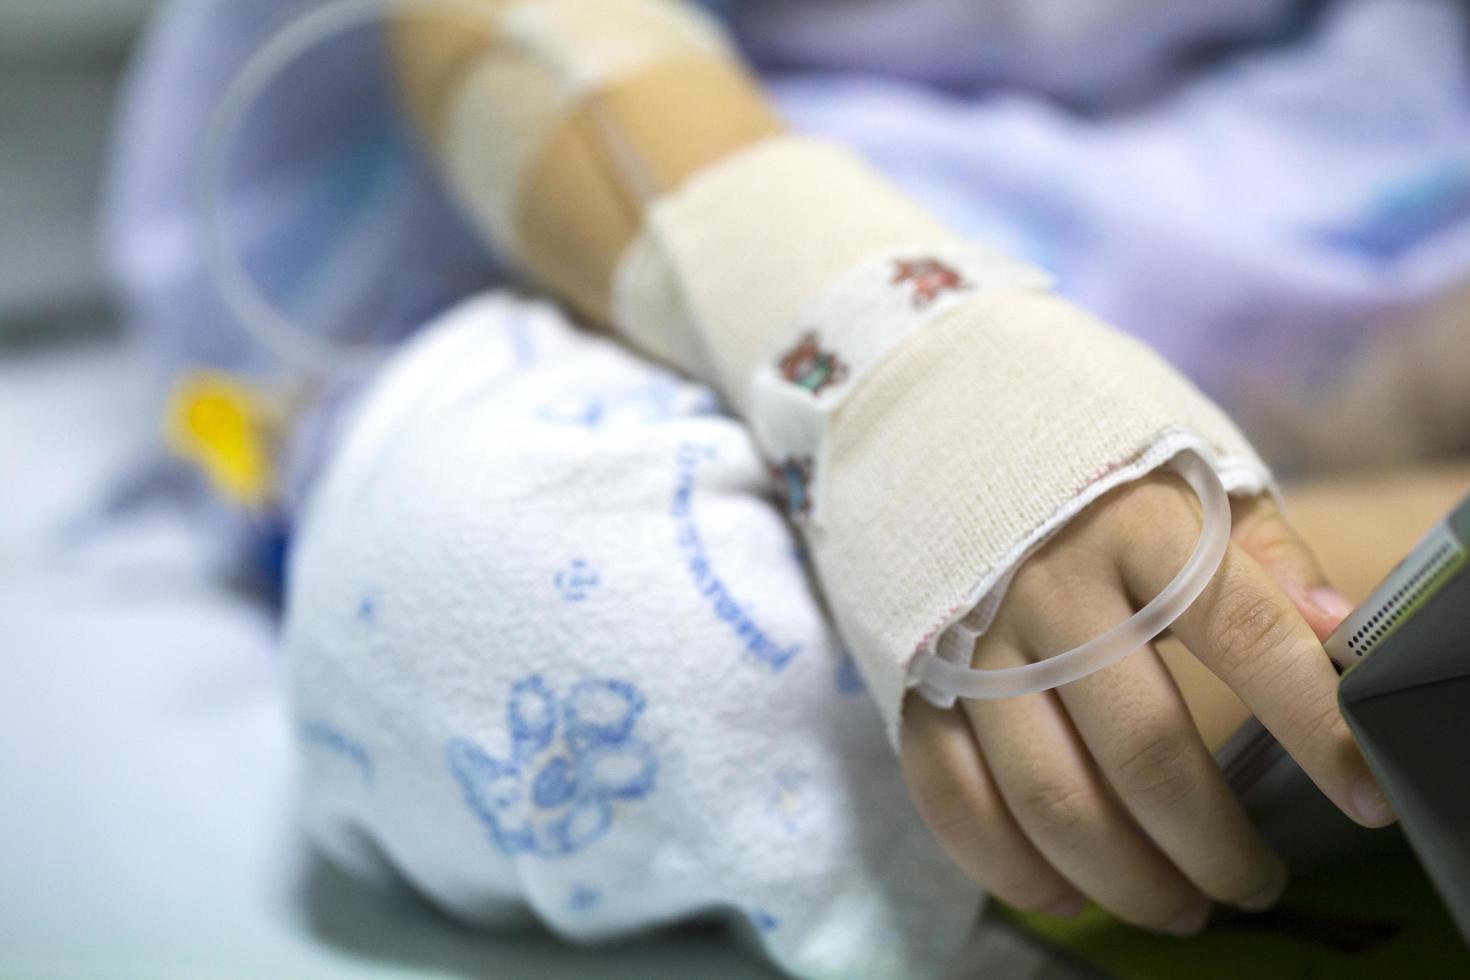 krankes Kind im Krankenhaus mit iv im Arm foto